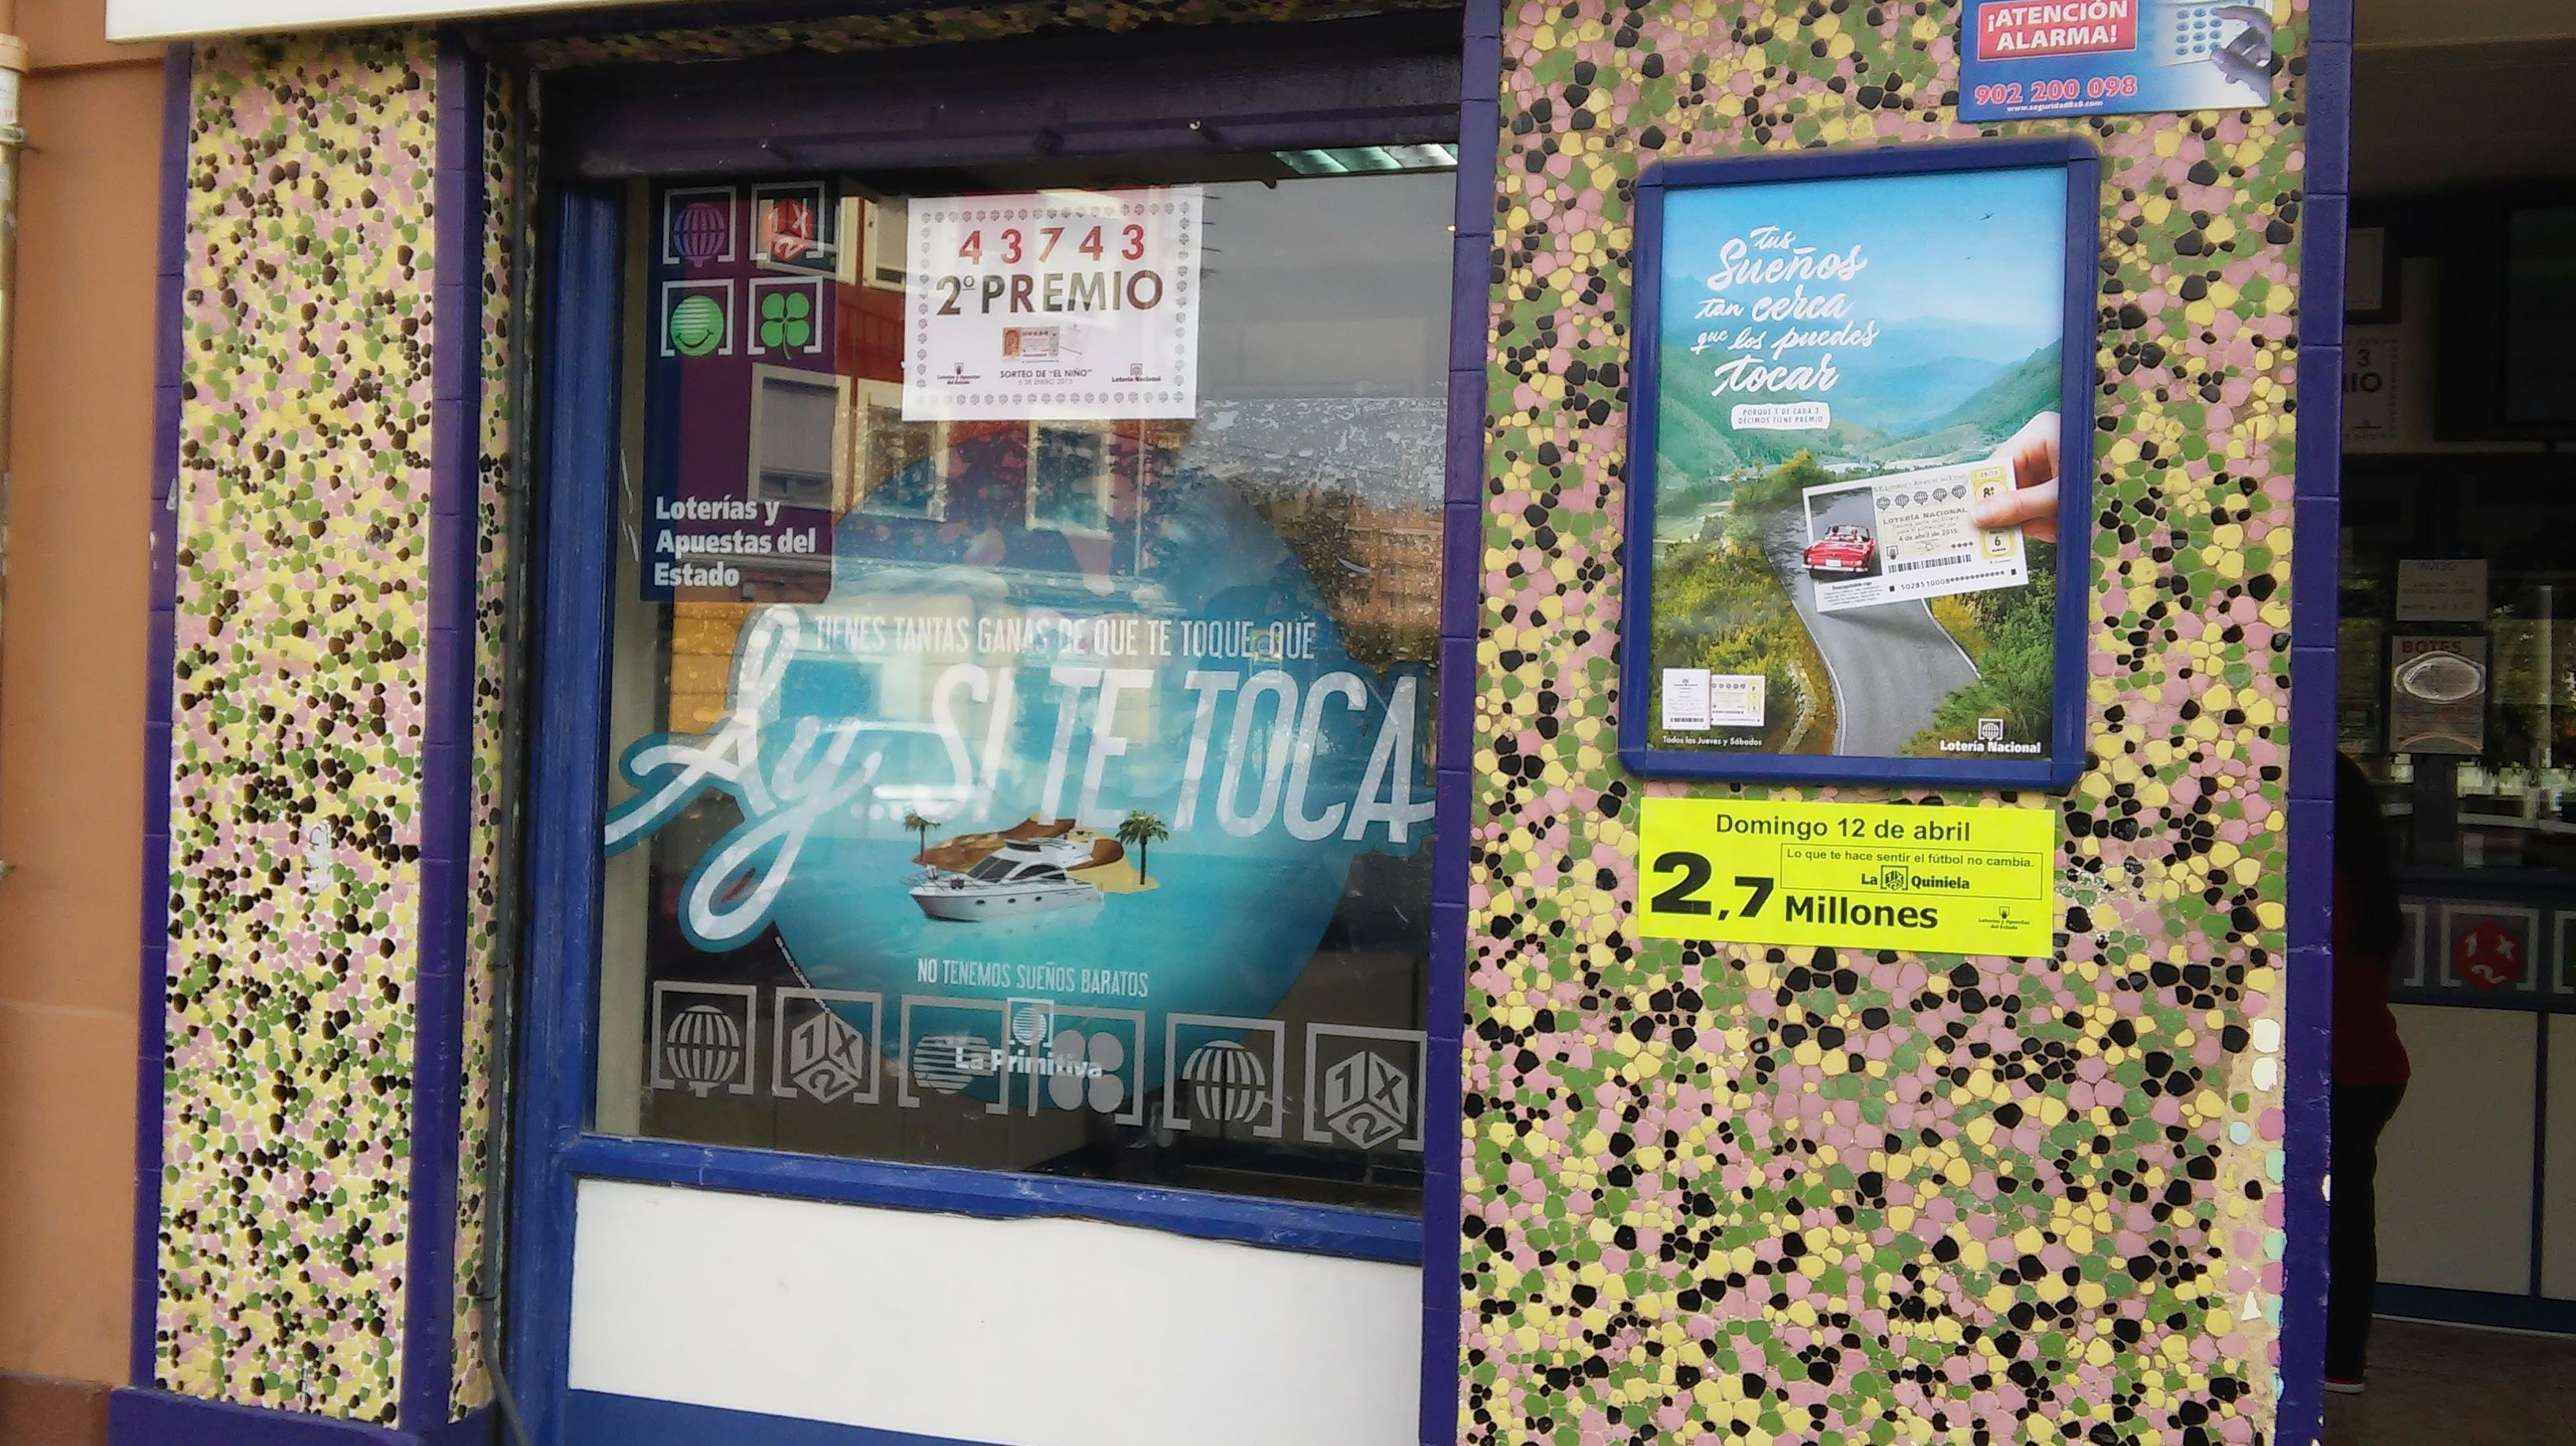 Administración de lotería premiada Valencia